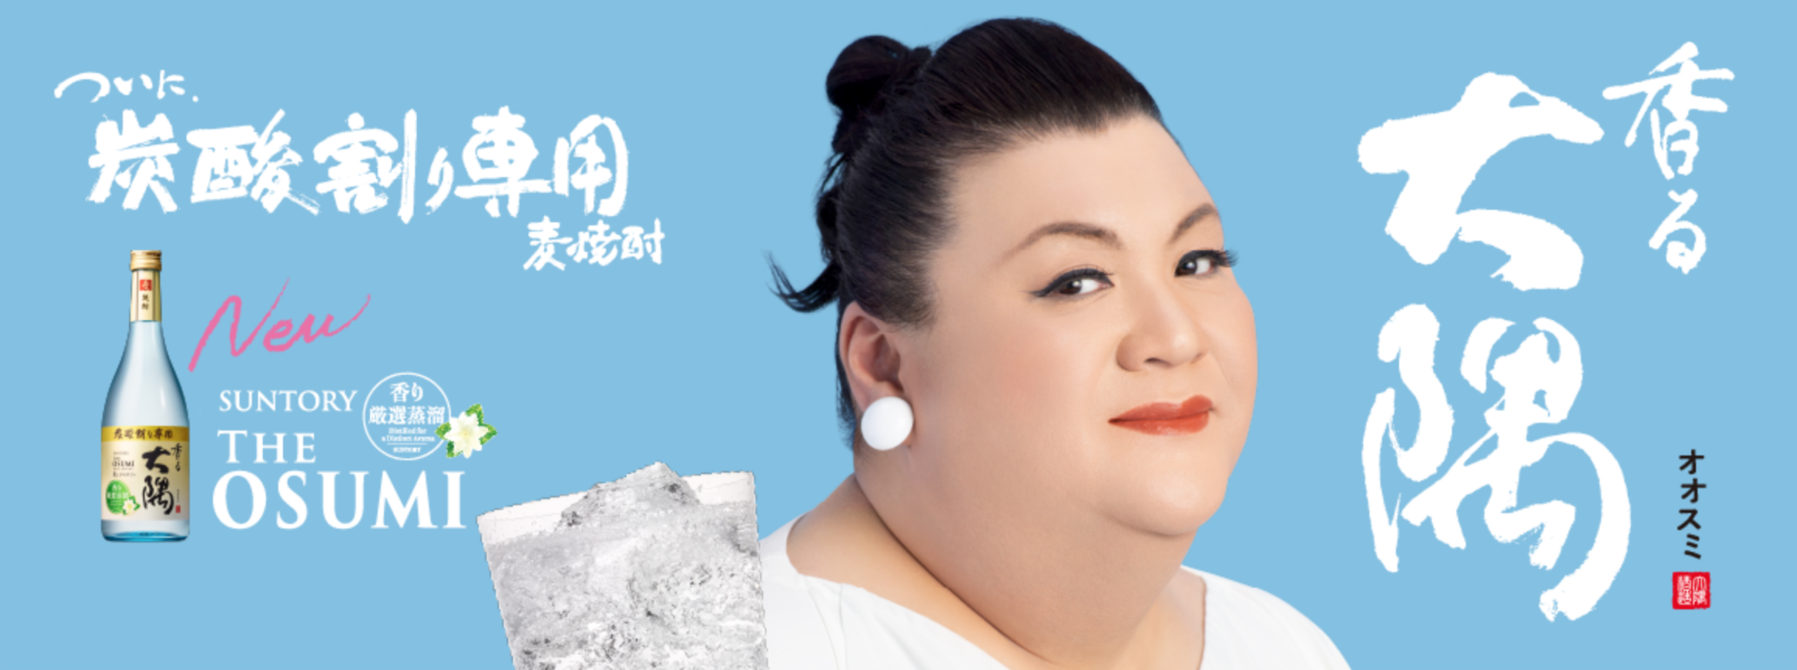 SUNTORY 香る大隅_広告ビジュアル 2021